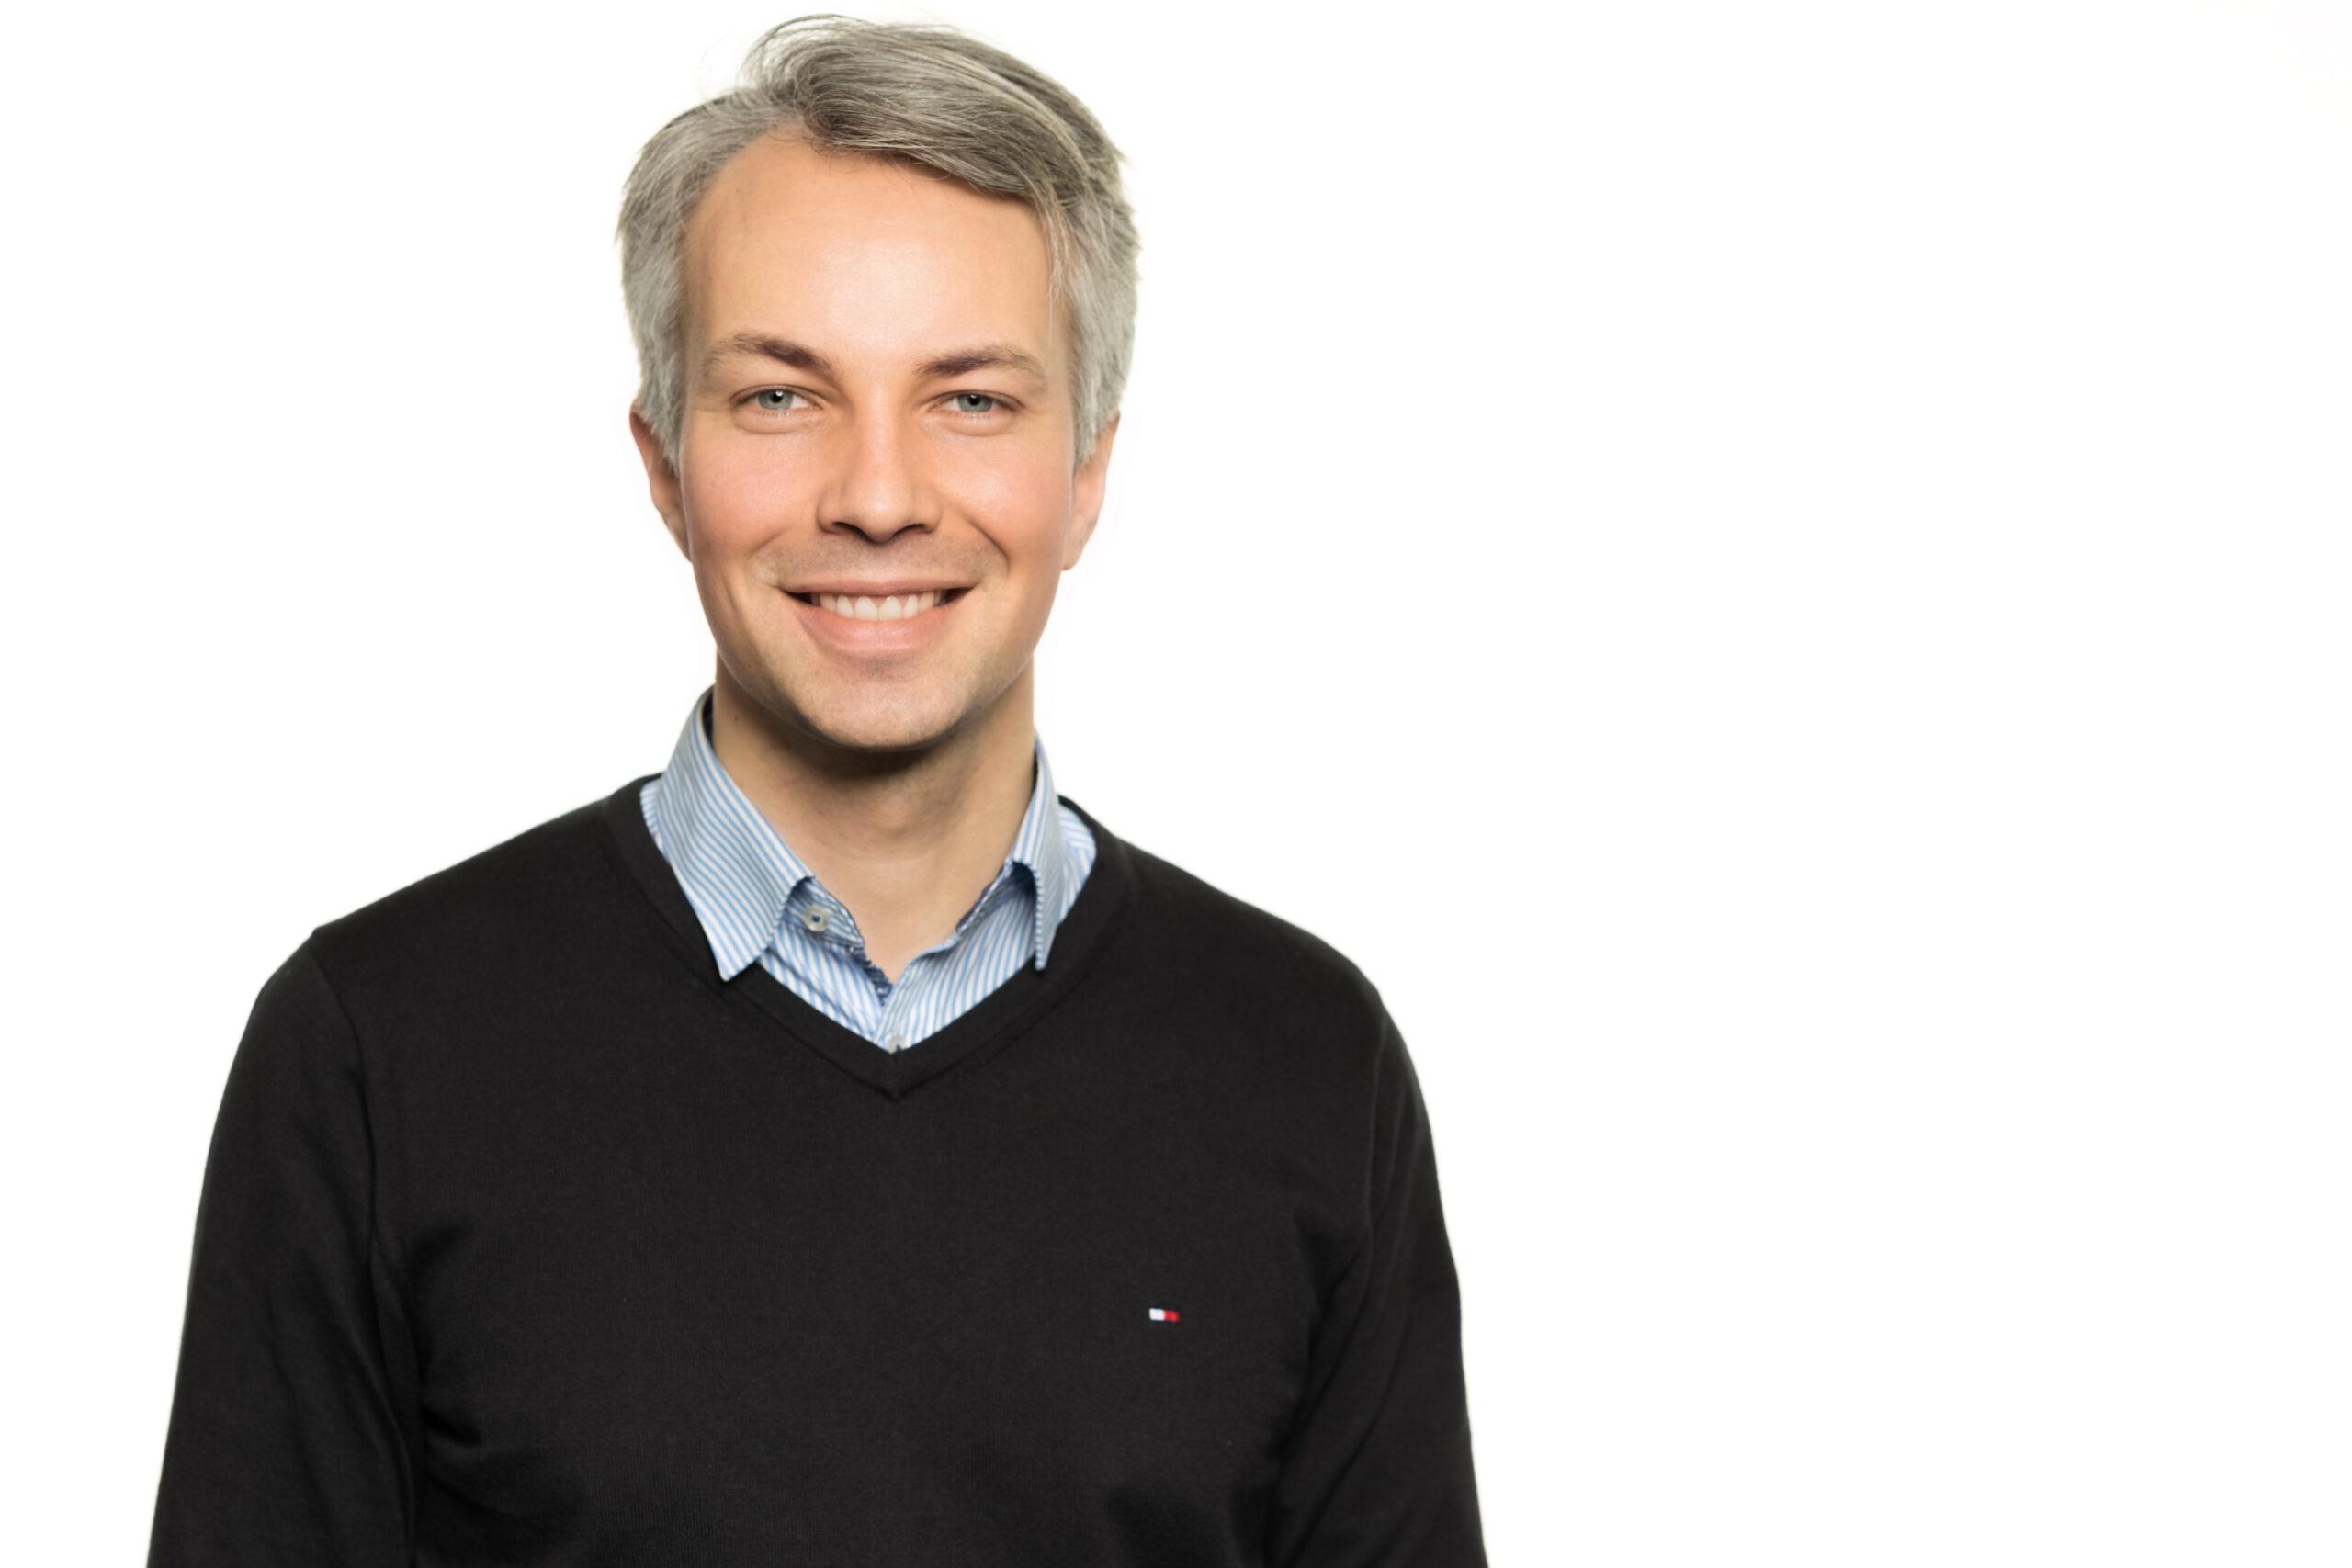 Jo Nicolay Berntsen